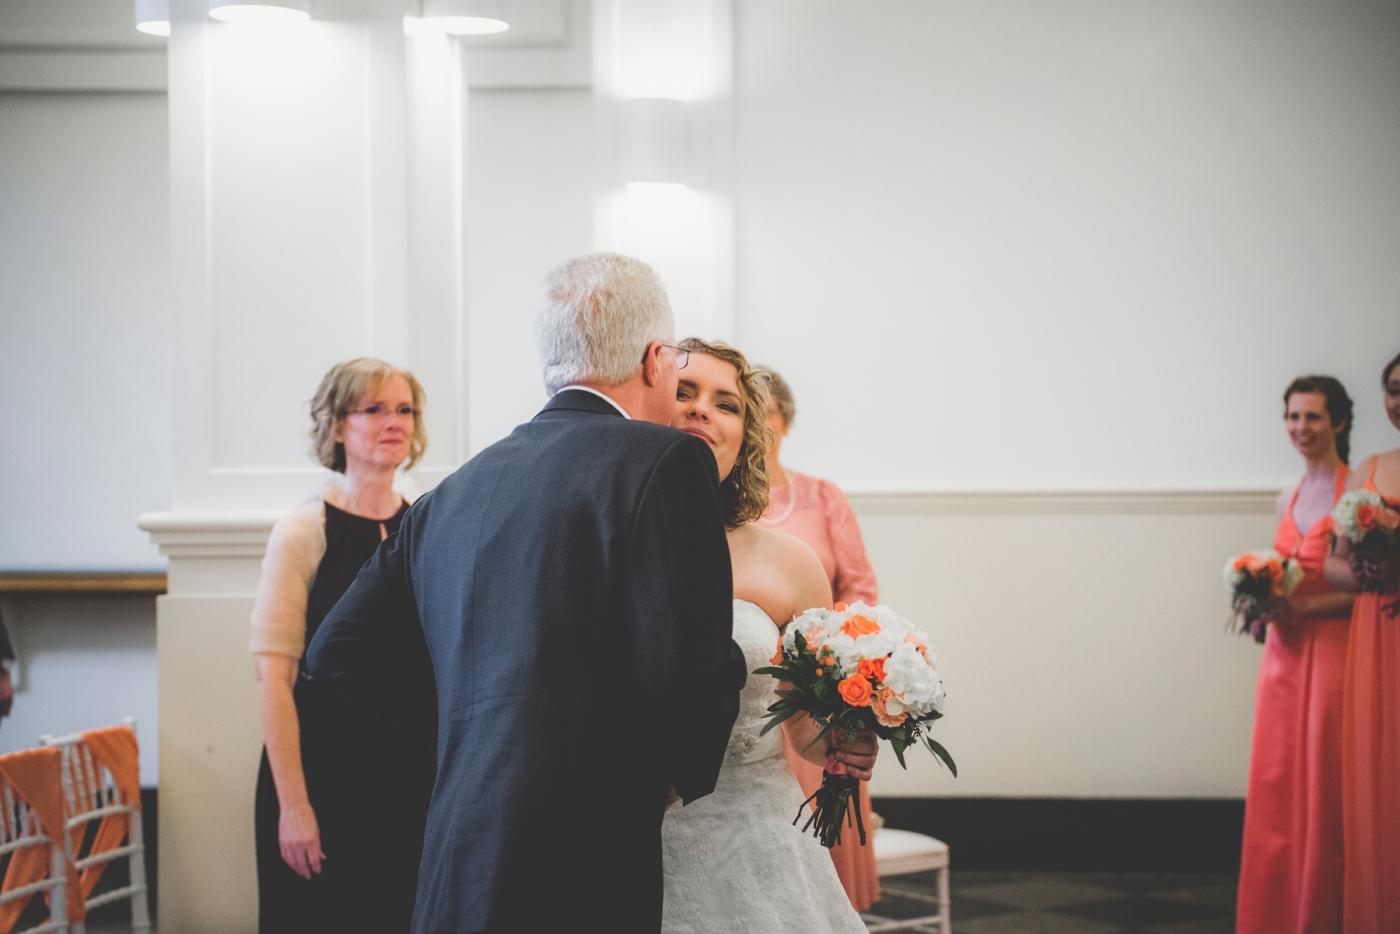 DSC_2572Everett_Wedding_Ballroom_Jane_Speleers_photography_Rachel_and_Edmund_Ceremony_2017